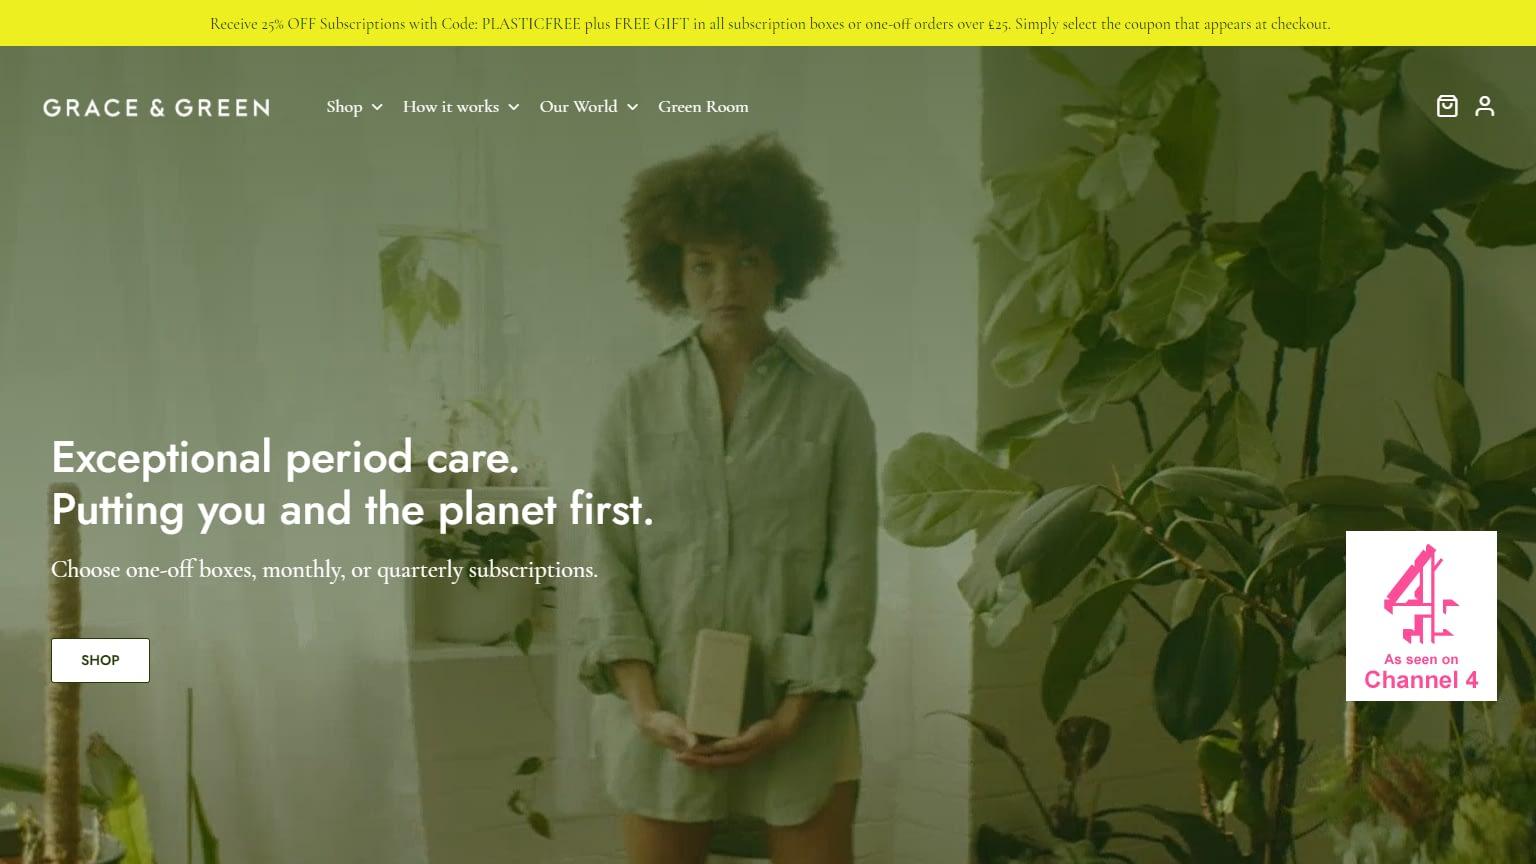 golivenow.uk website design Grace and Green screenshot 2 - golivenow.uk